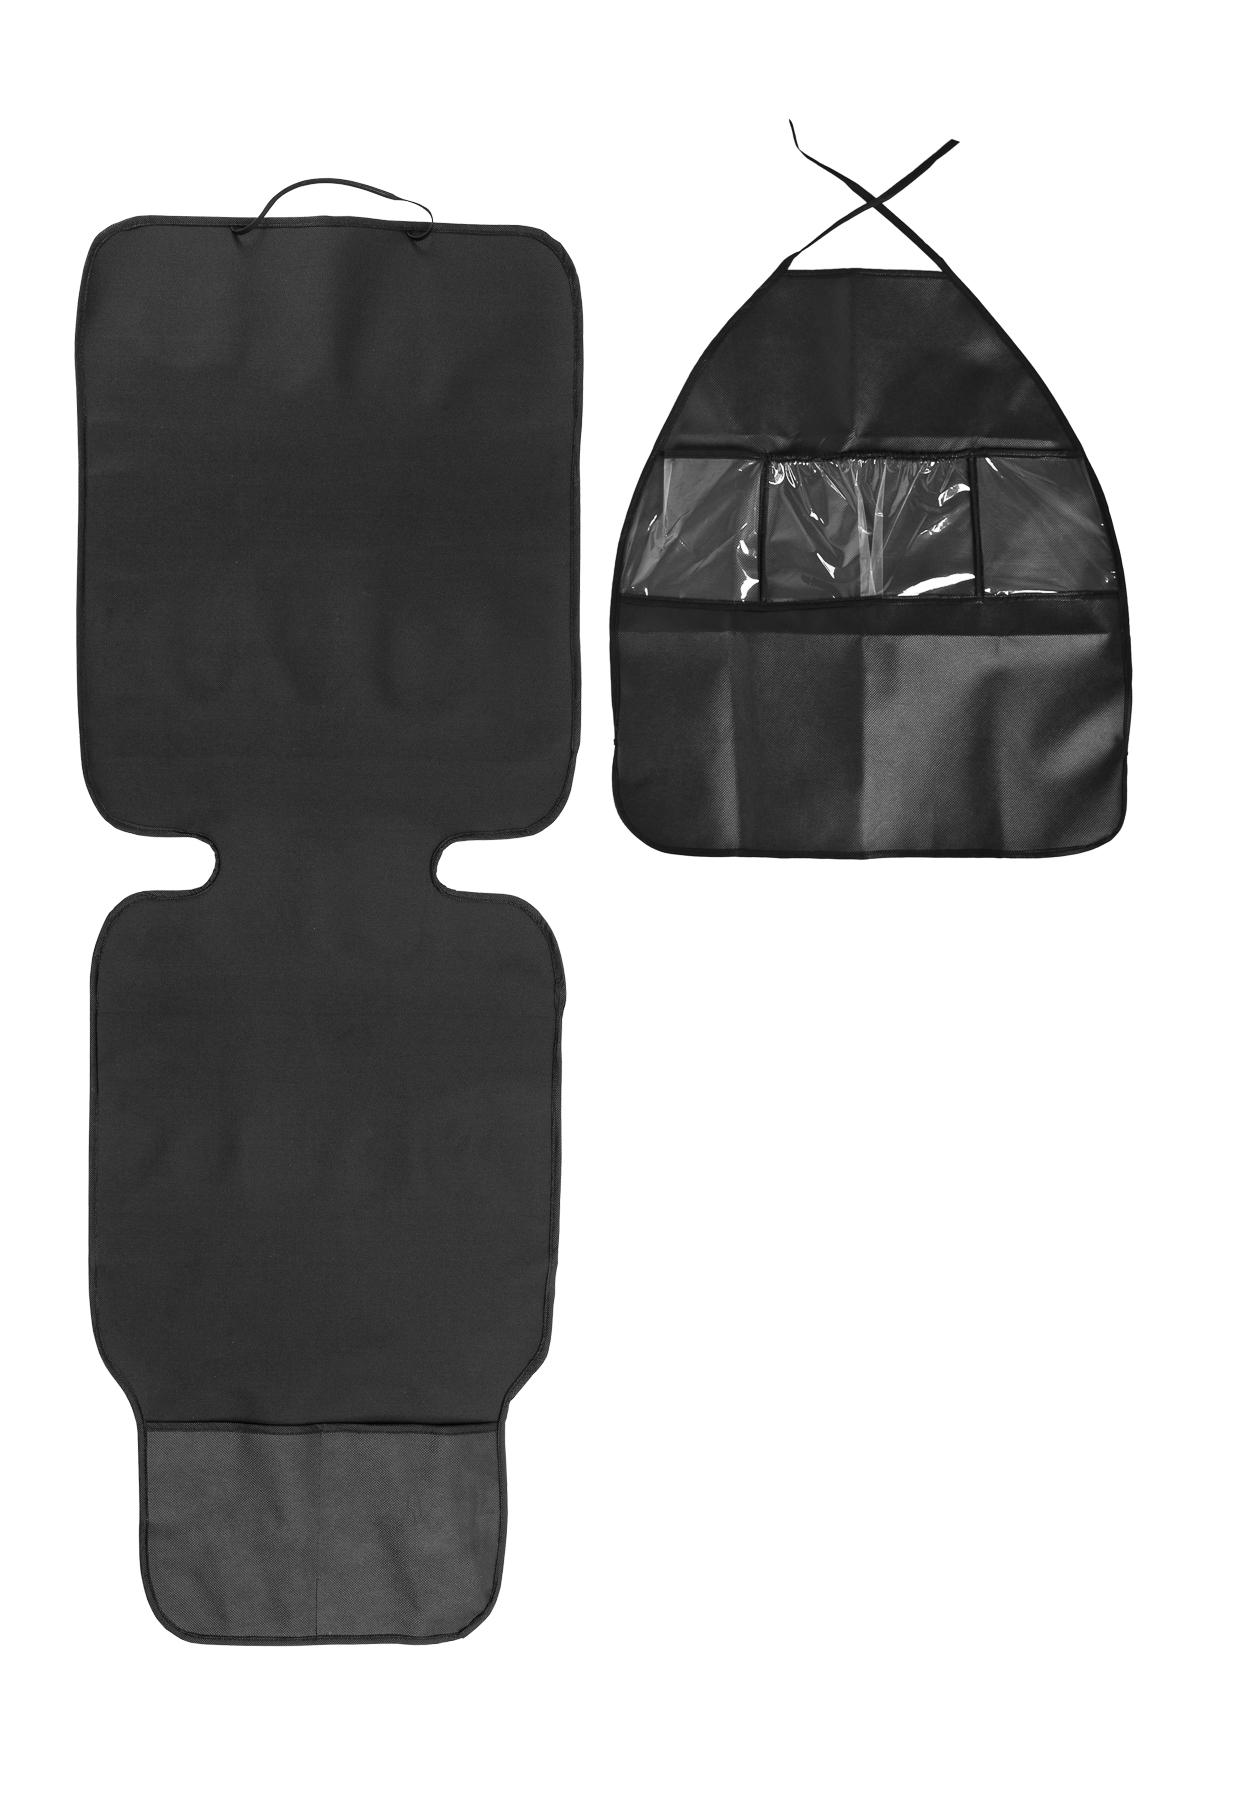 Zestaw 2w1 (mata pod fotelik + organizer na fotel)